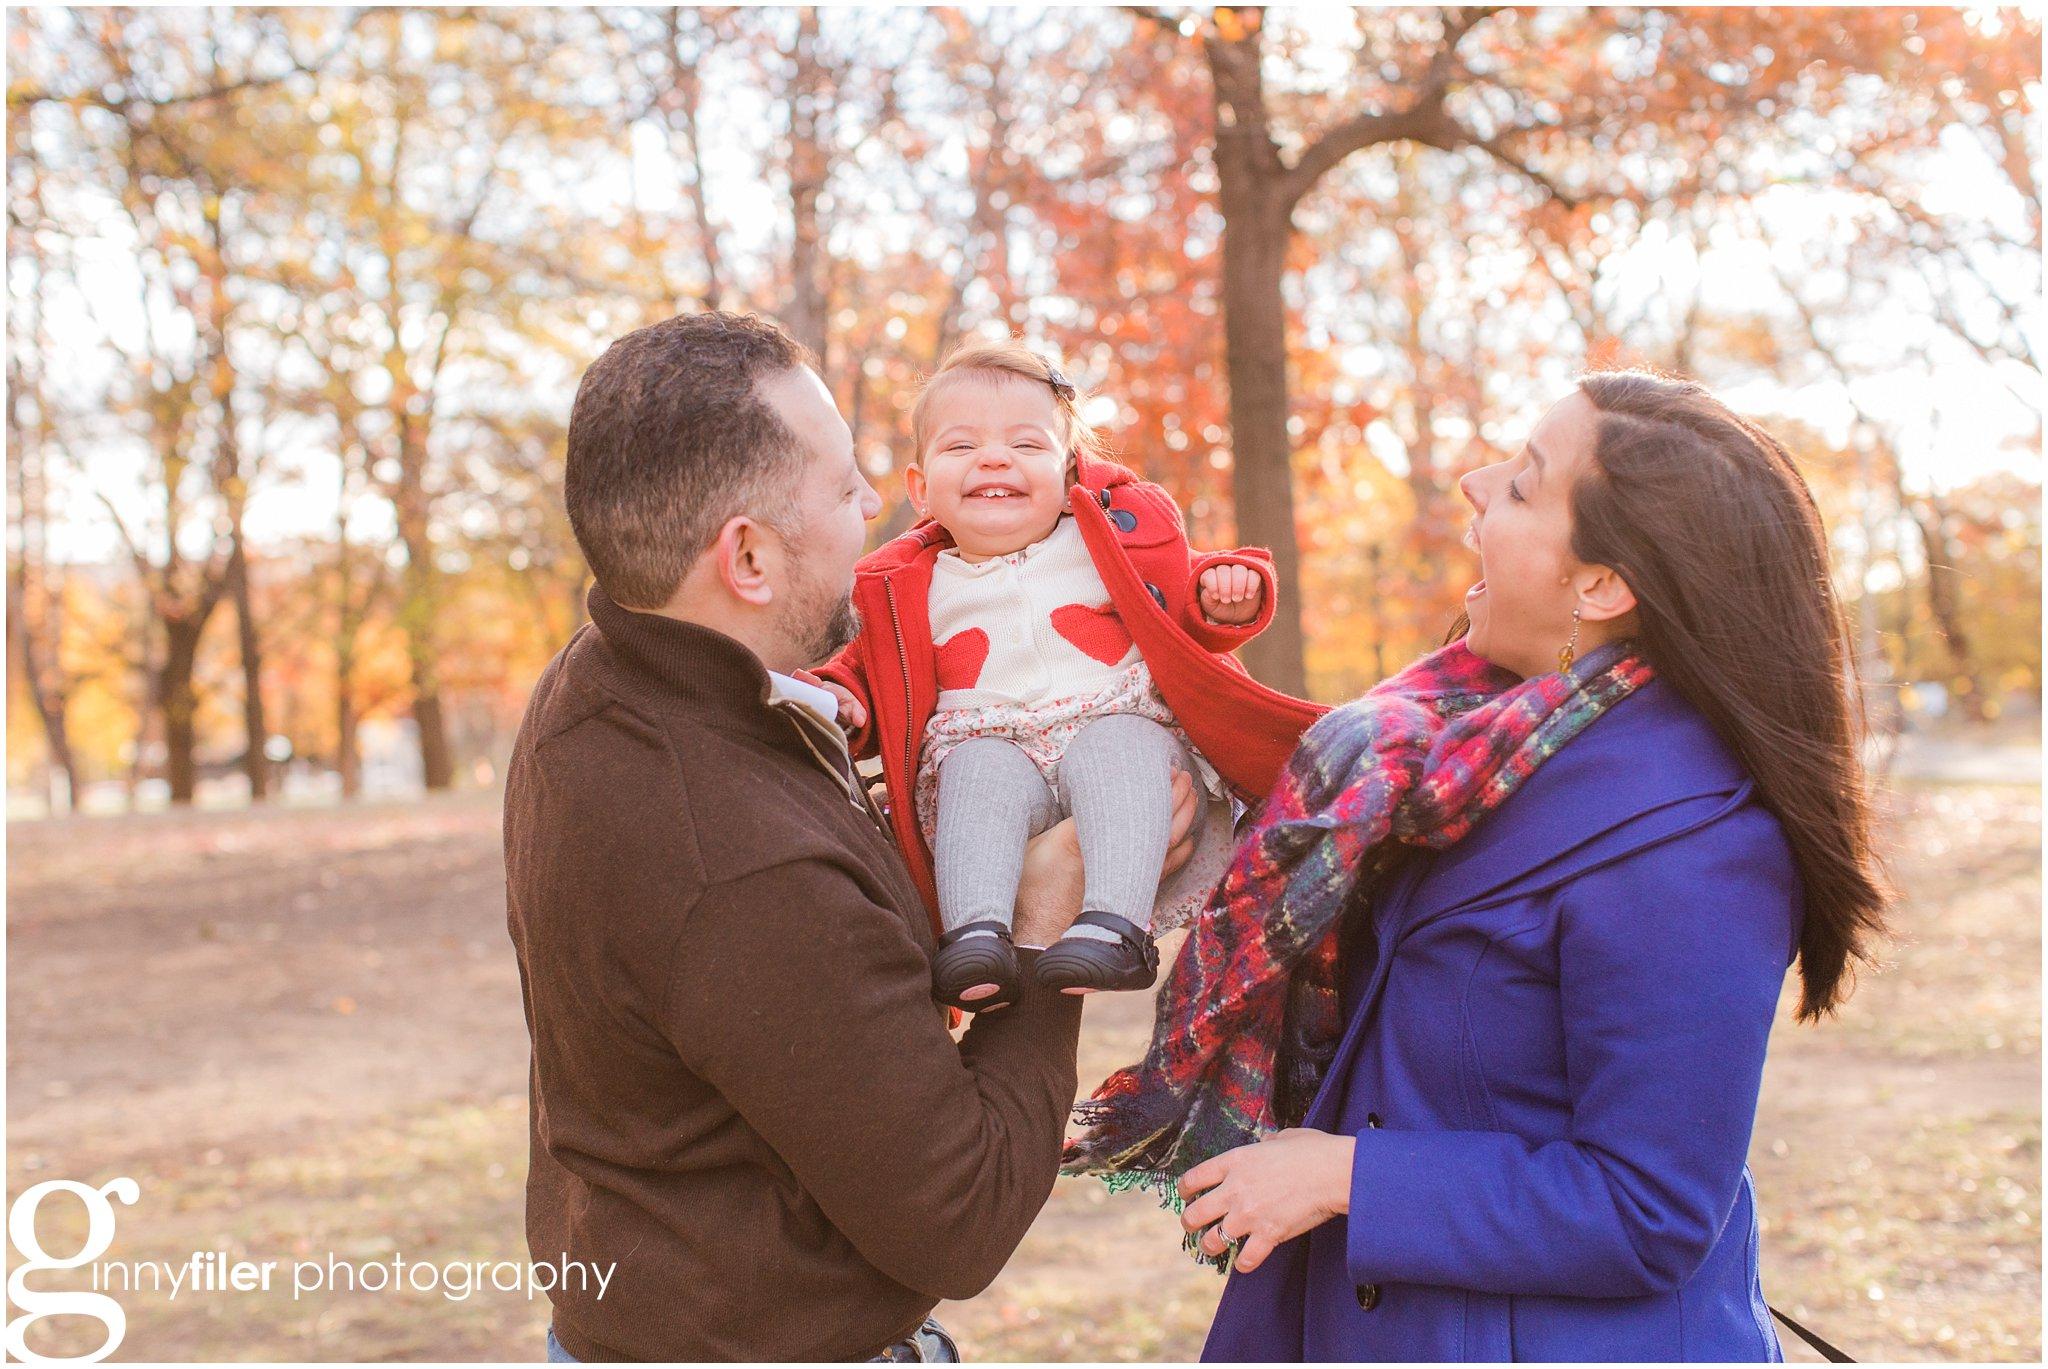 family_photography_Sanchez_0011.jpg